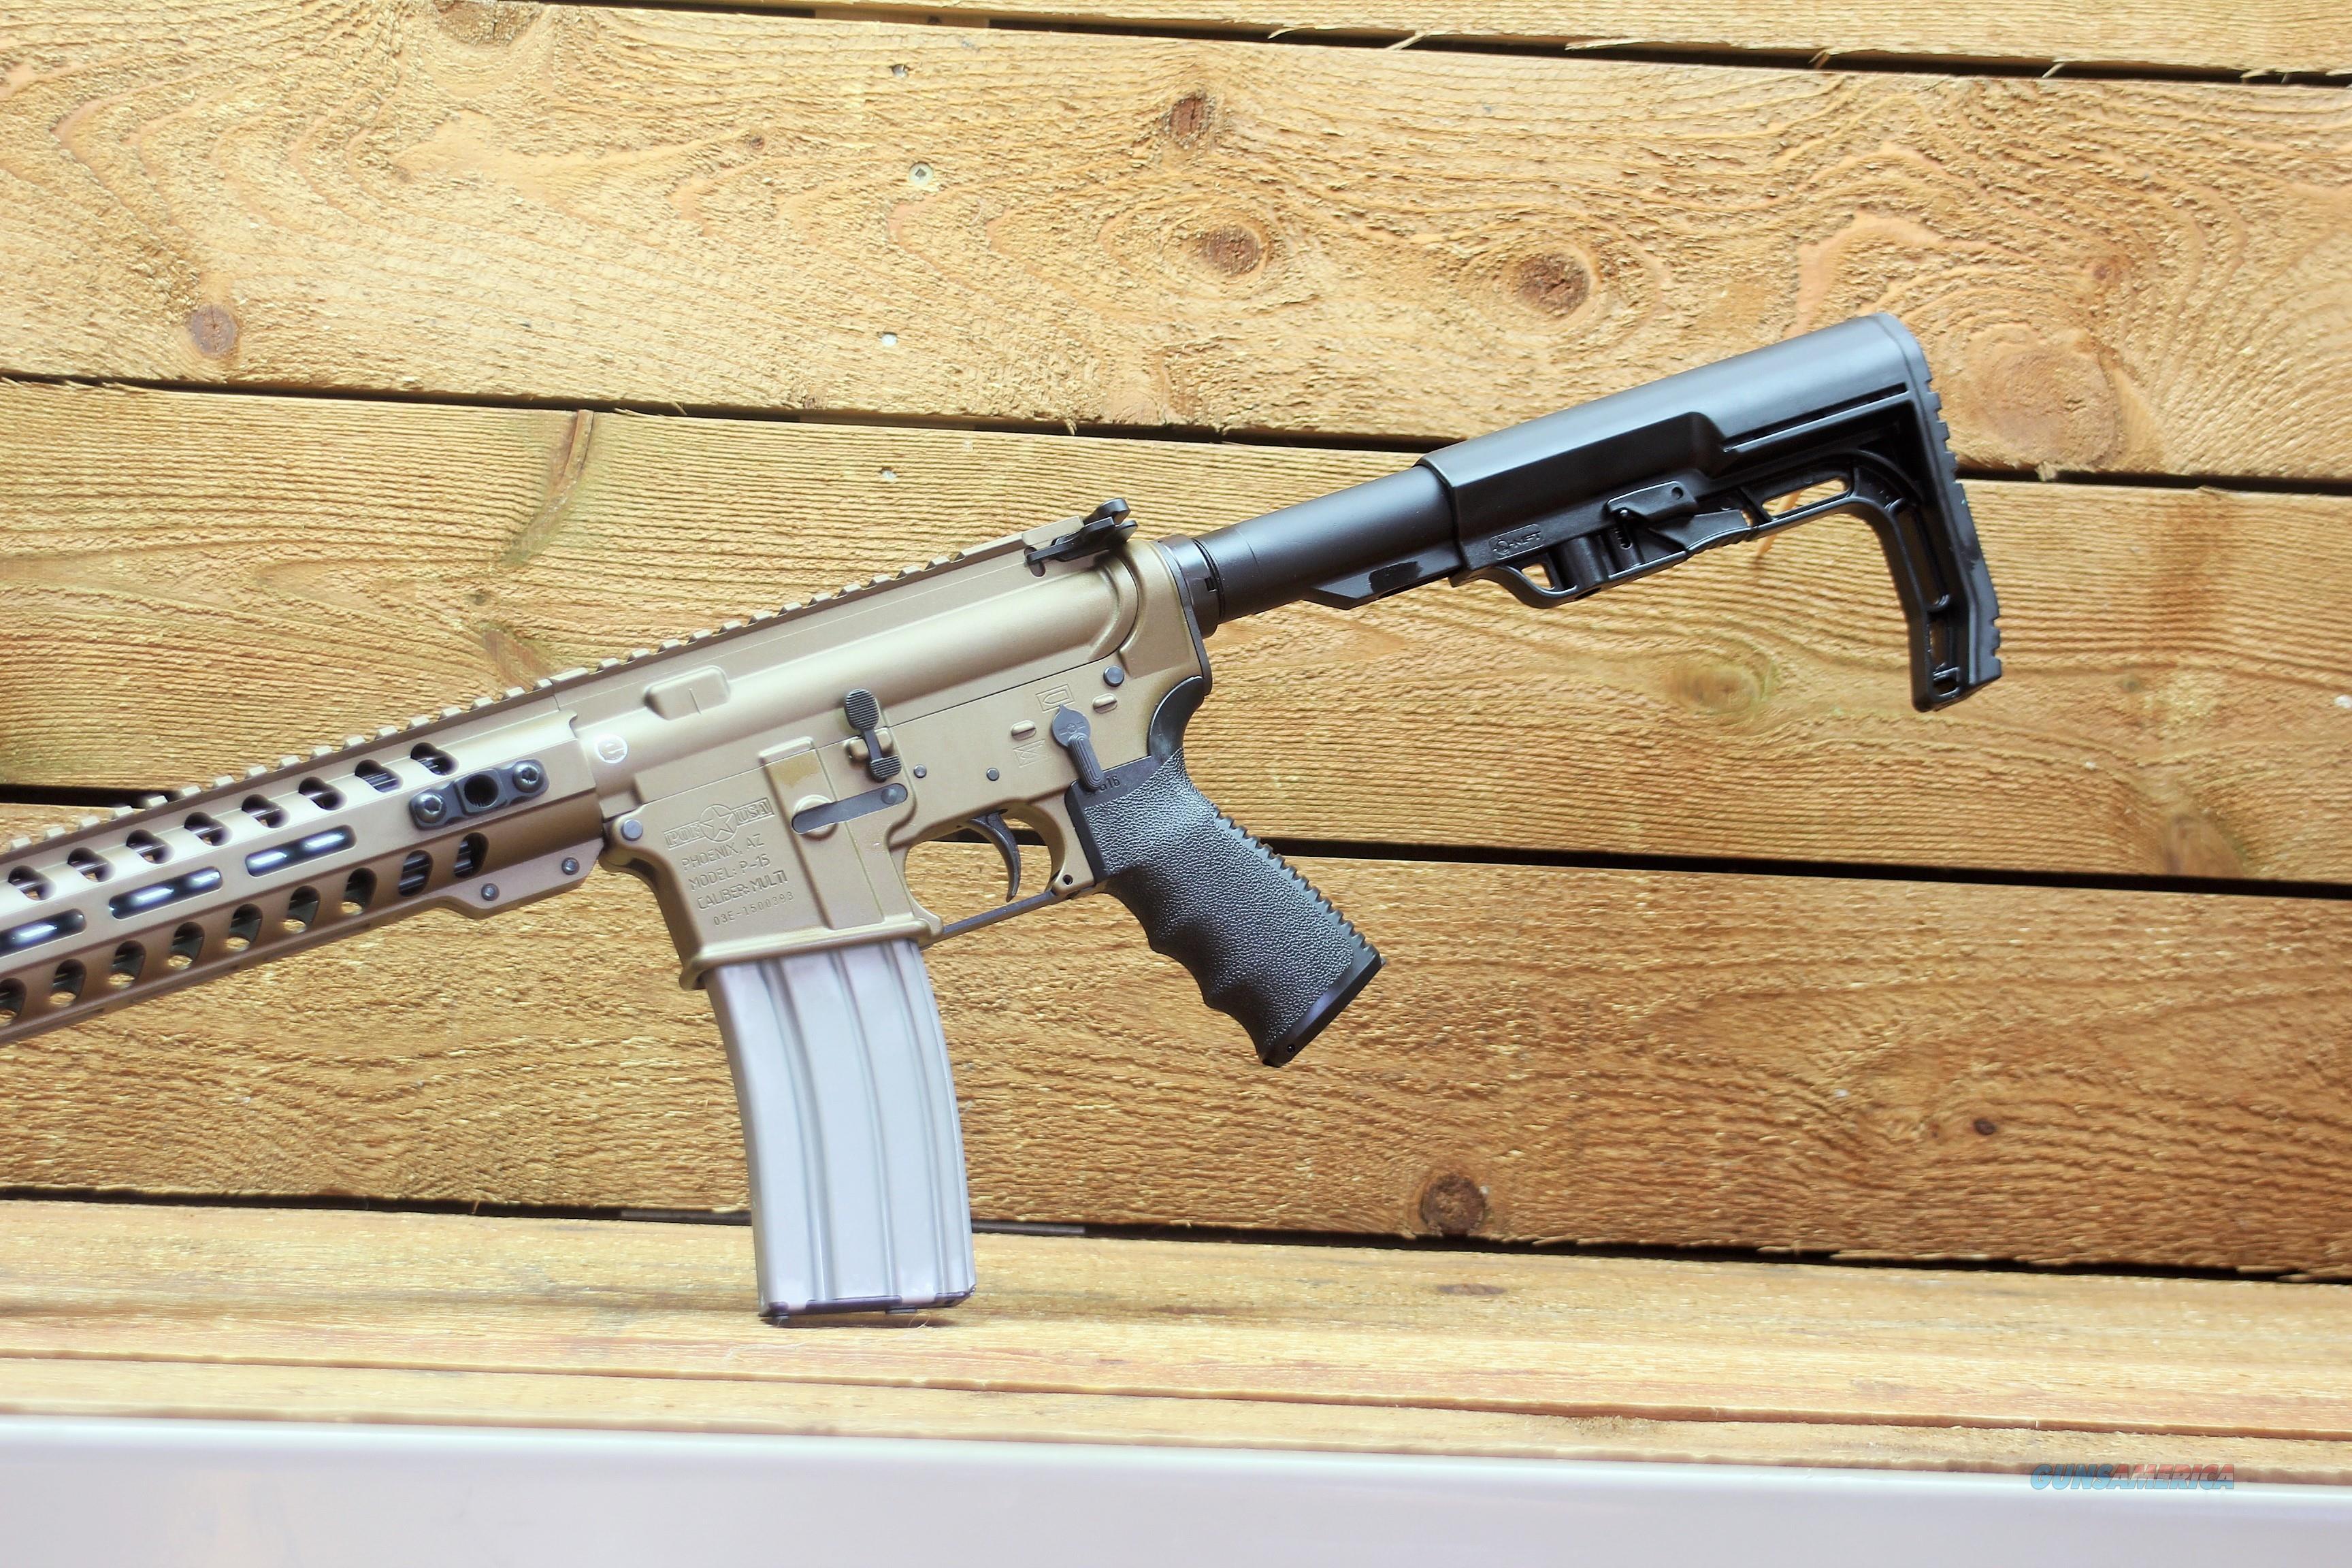 EASY PAY $84 DOWN POF USA Patriot Ordnance Fac for sale